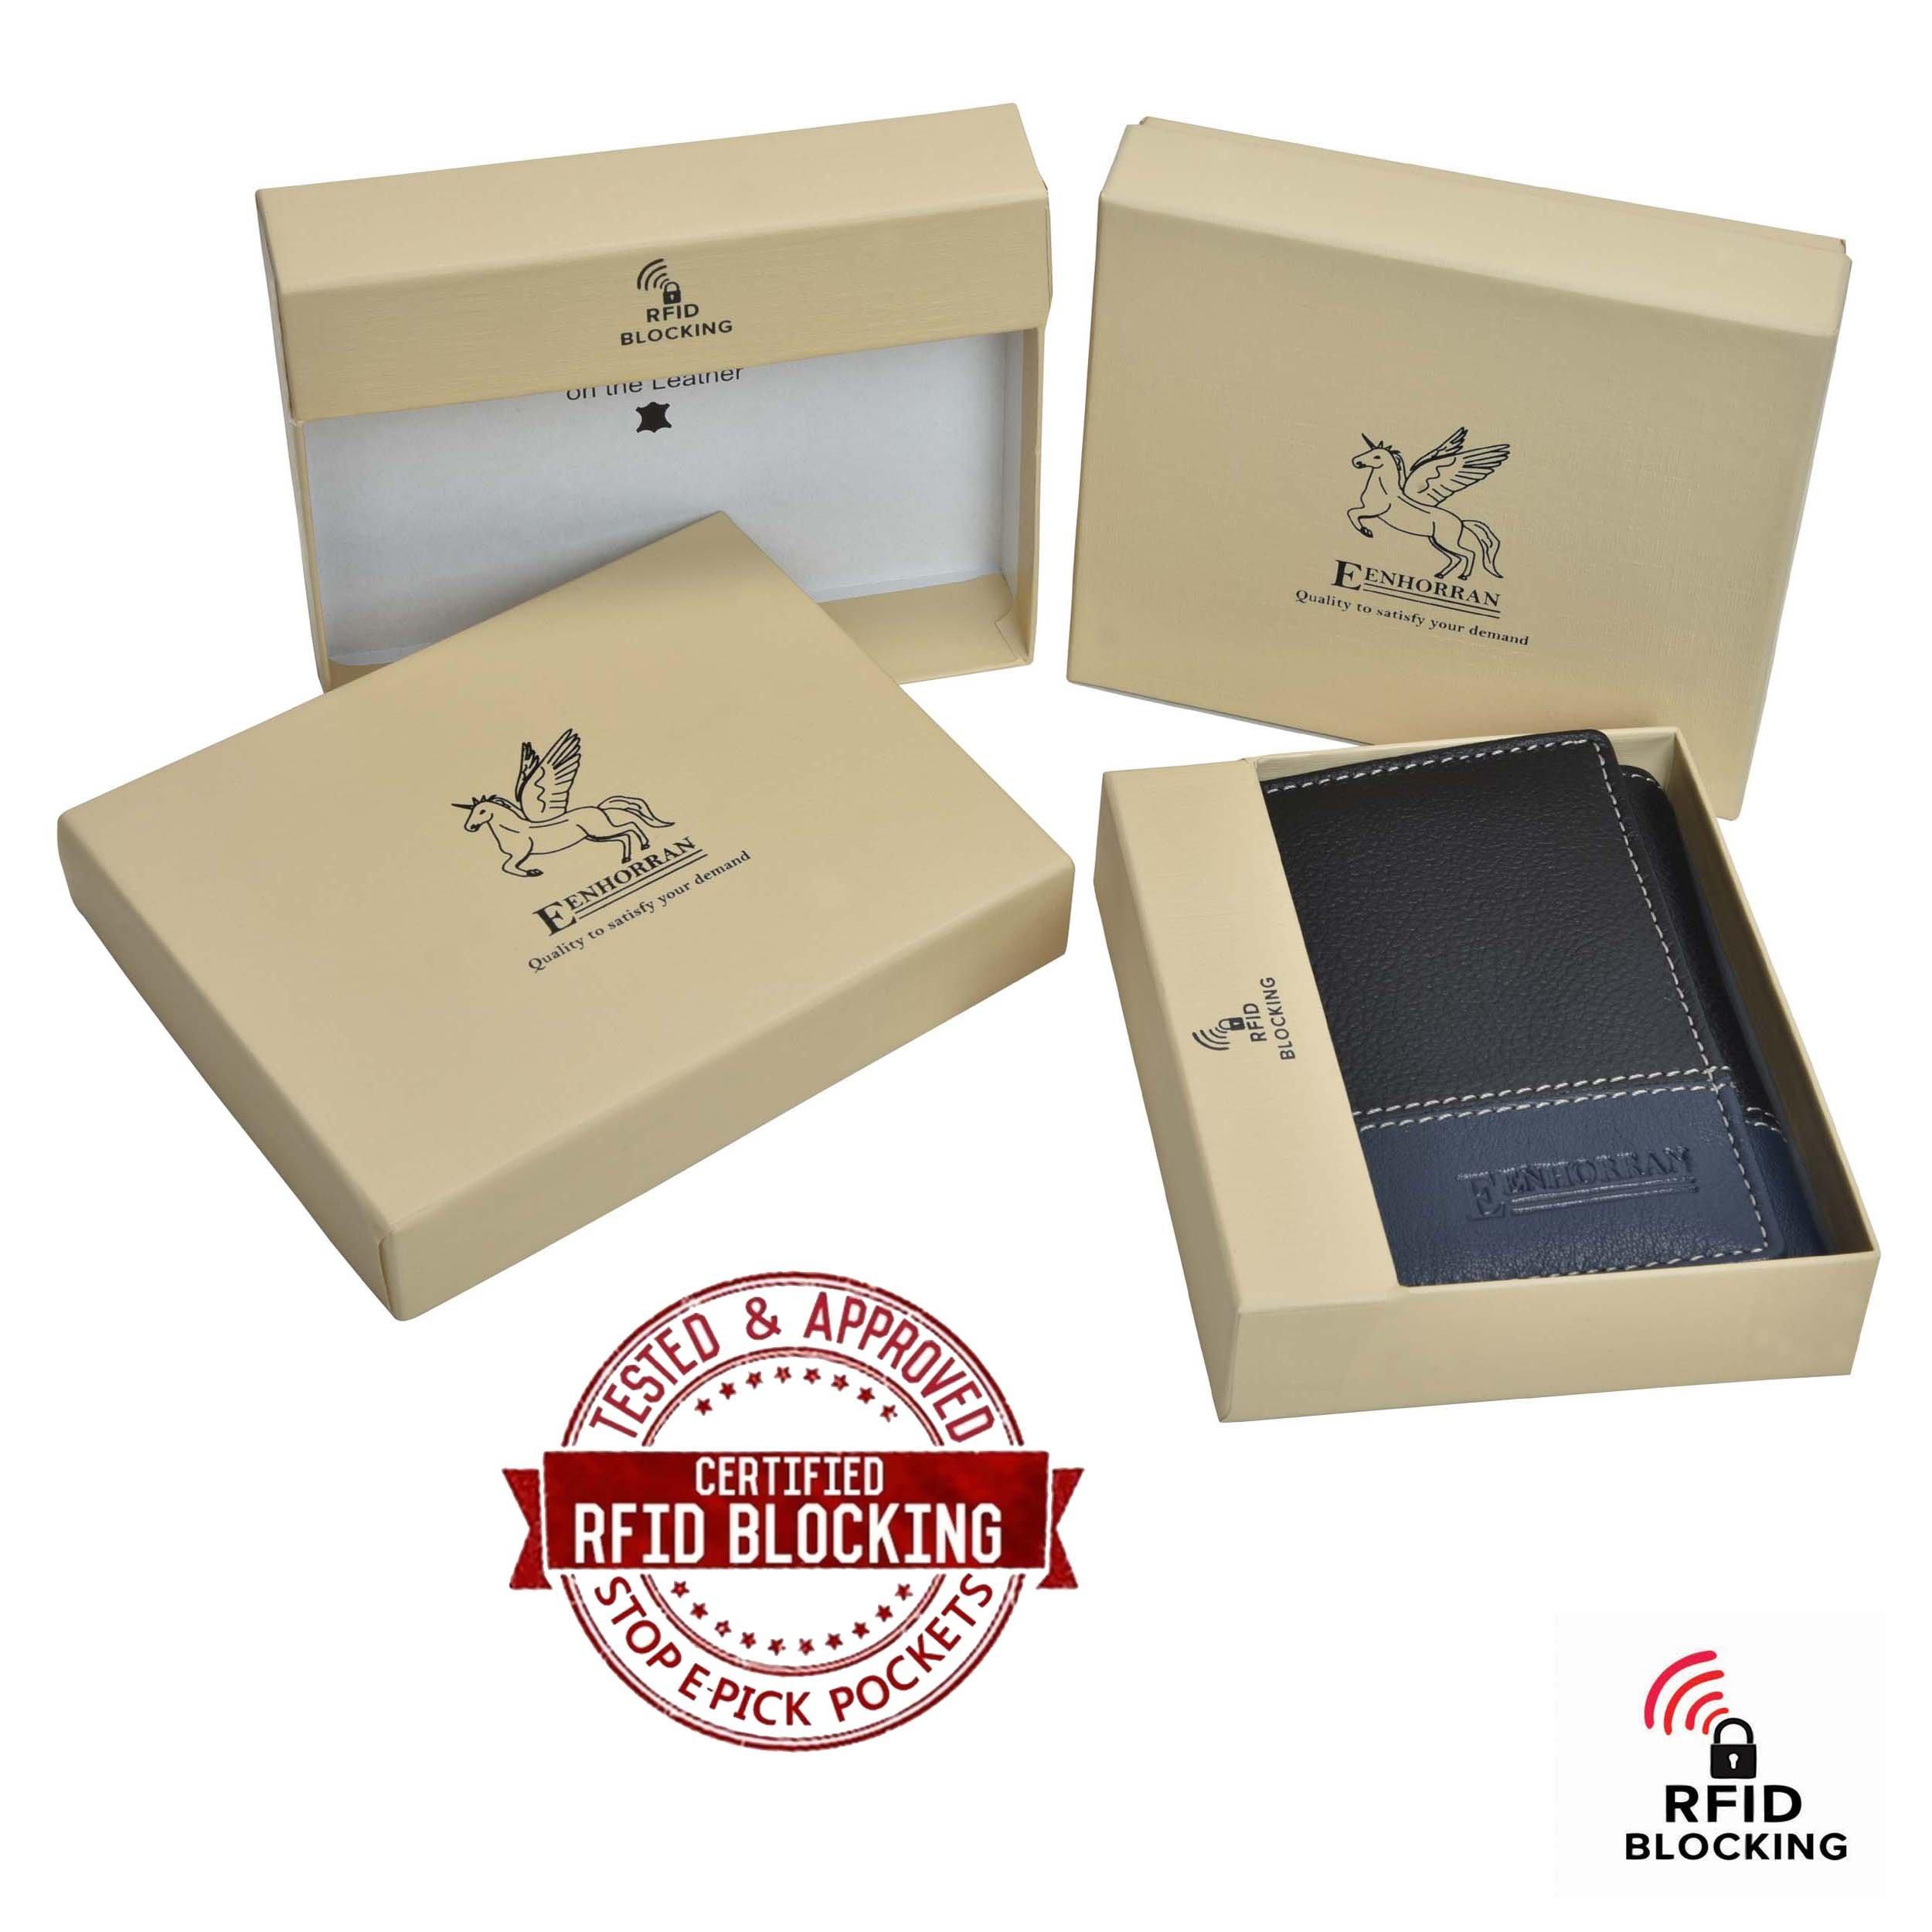 RFID Leather Trifold Wallets for Men - Handmade Slim Mens Wallet 6 Credit Card ID Window and Gift Box Secure by EENHORRAN (Black & Navy) by EENHORRAN (Image #6)